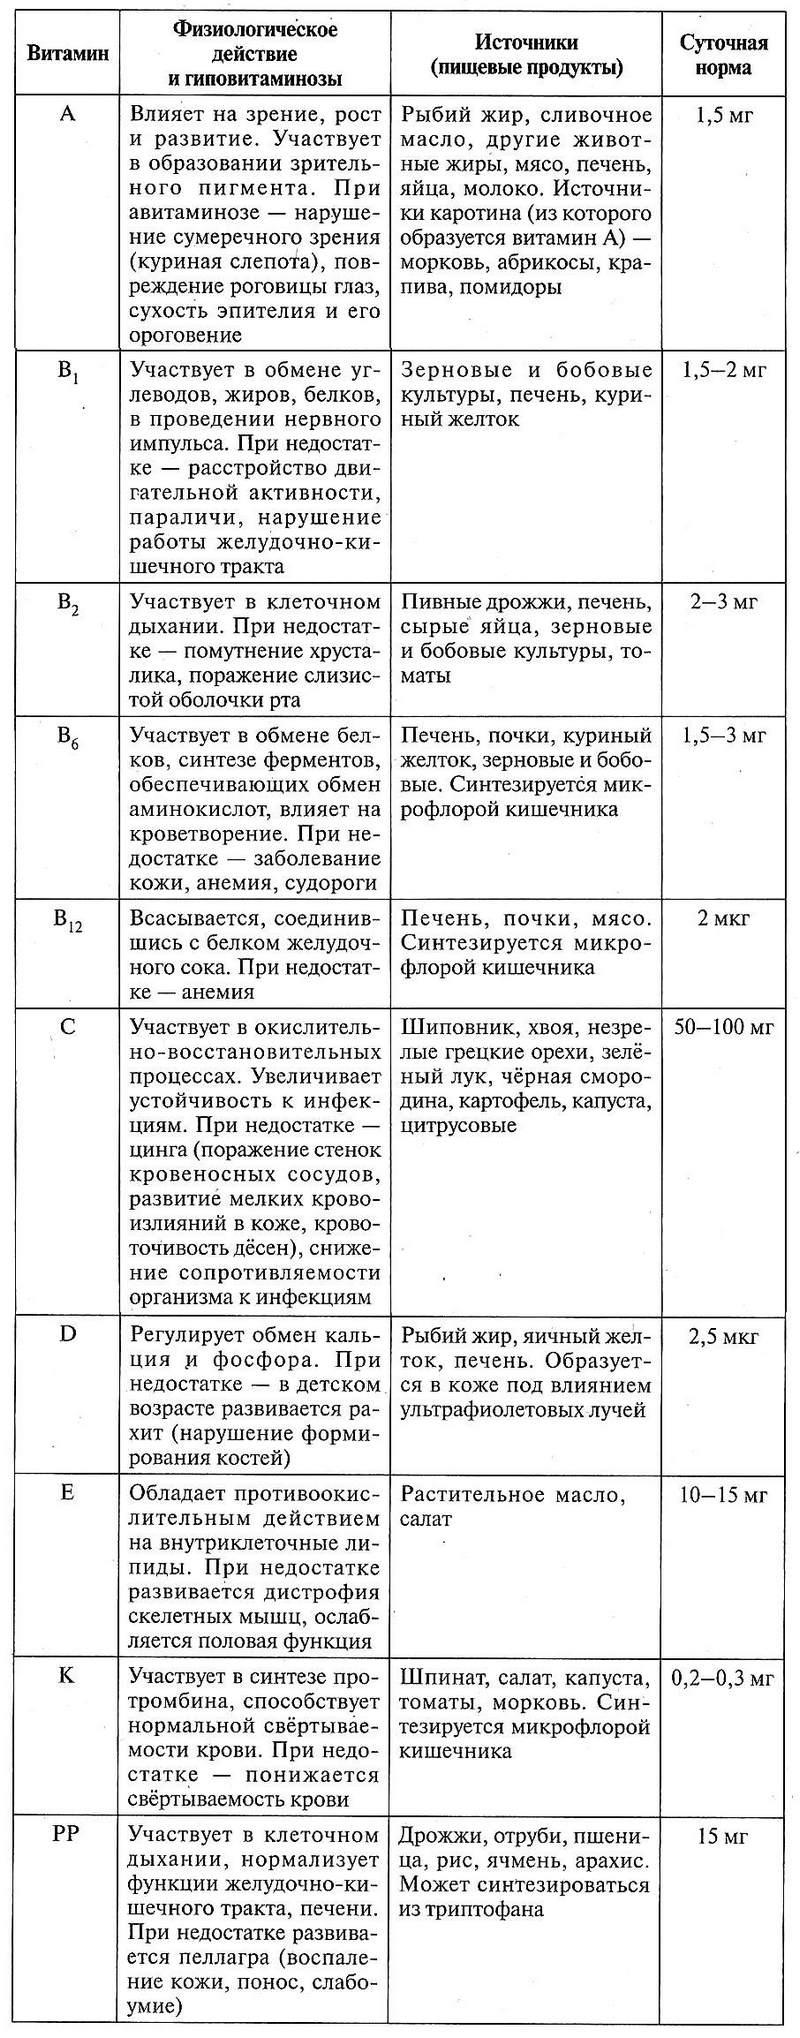 Таблица 12.13. Характеристика важнейших витаминов